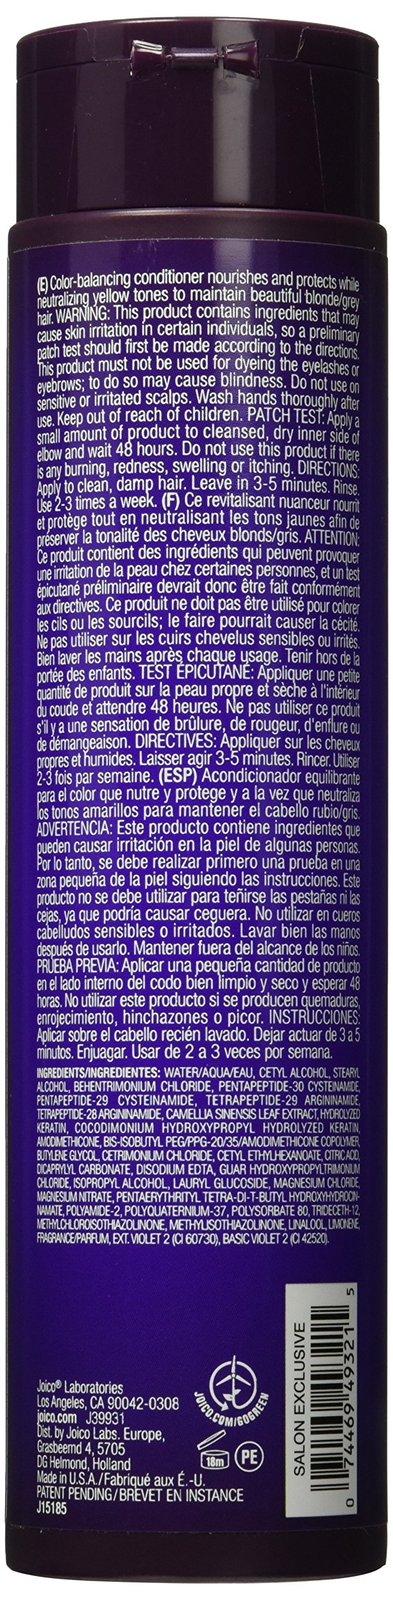 Joico Color Balance Purple Conditioner, 10.1 Oz